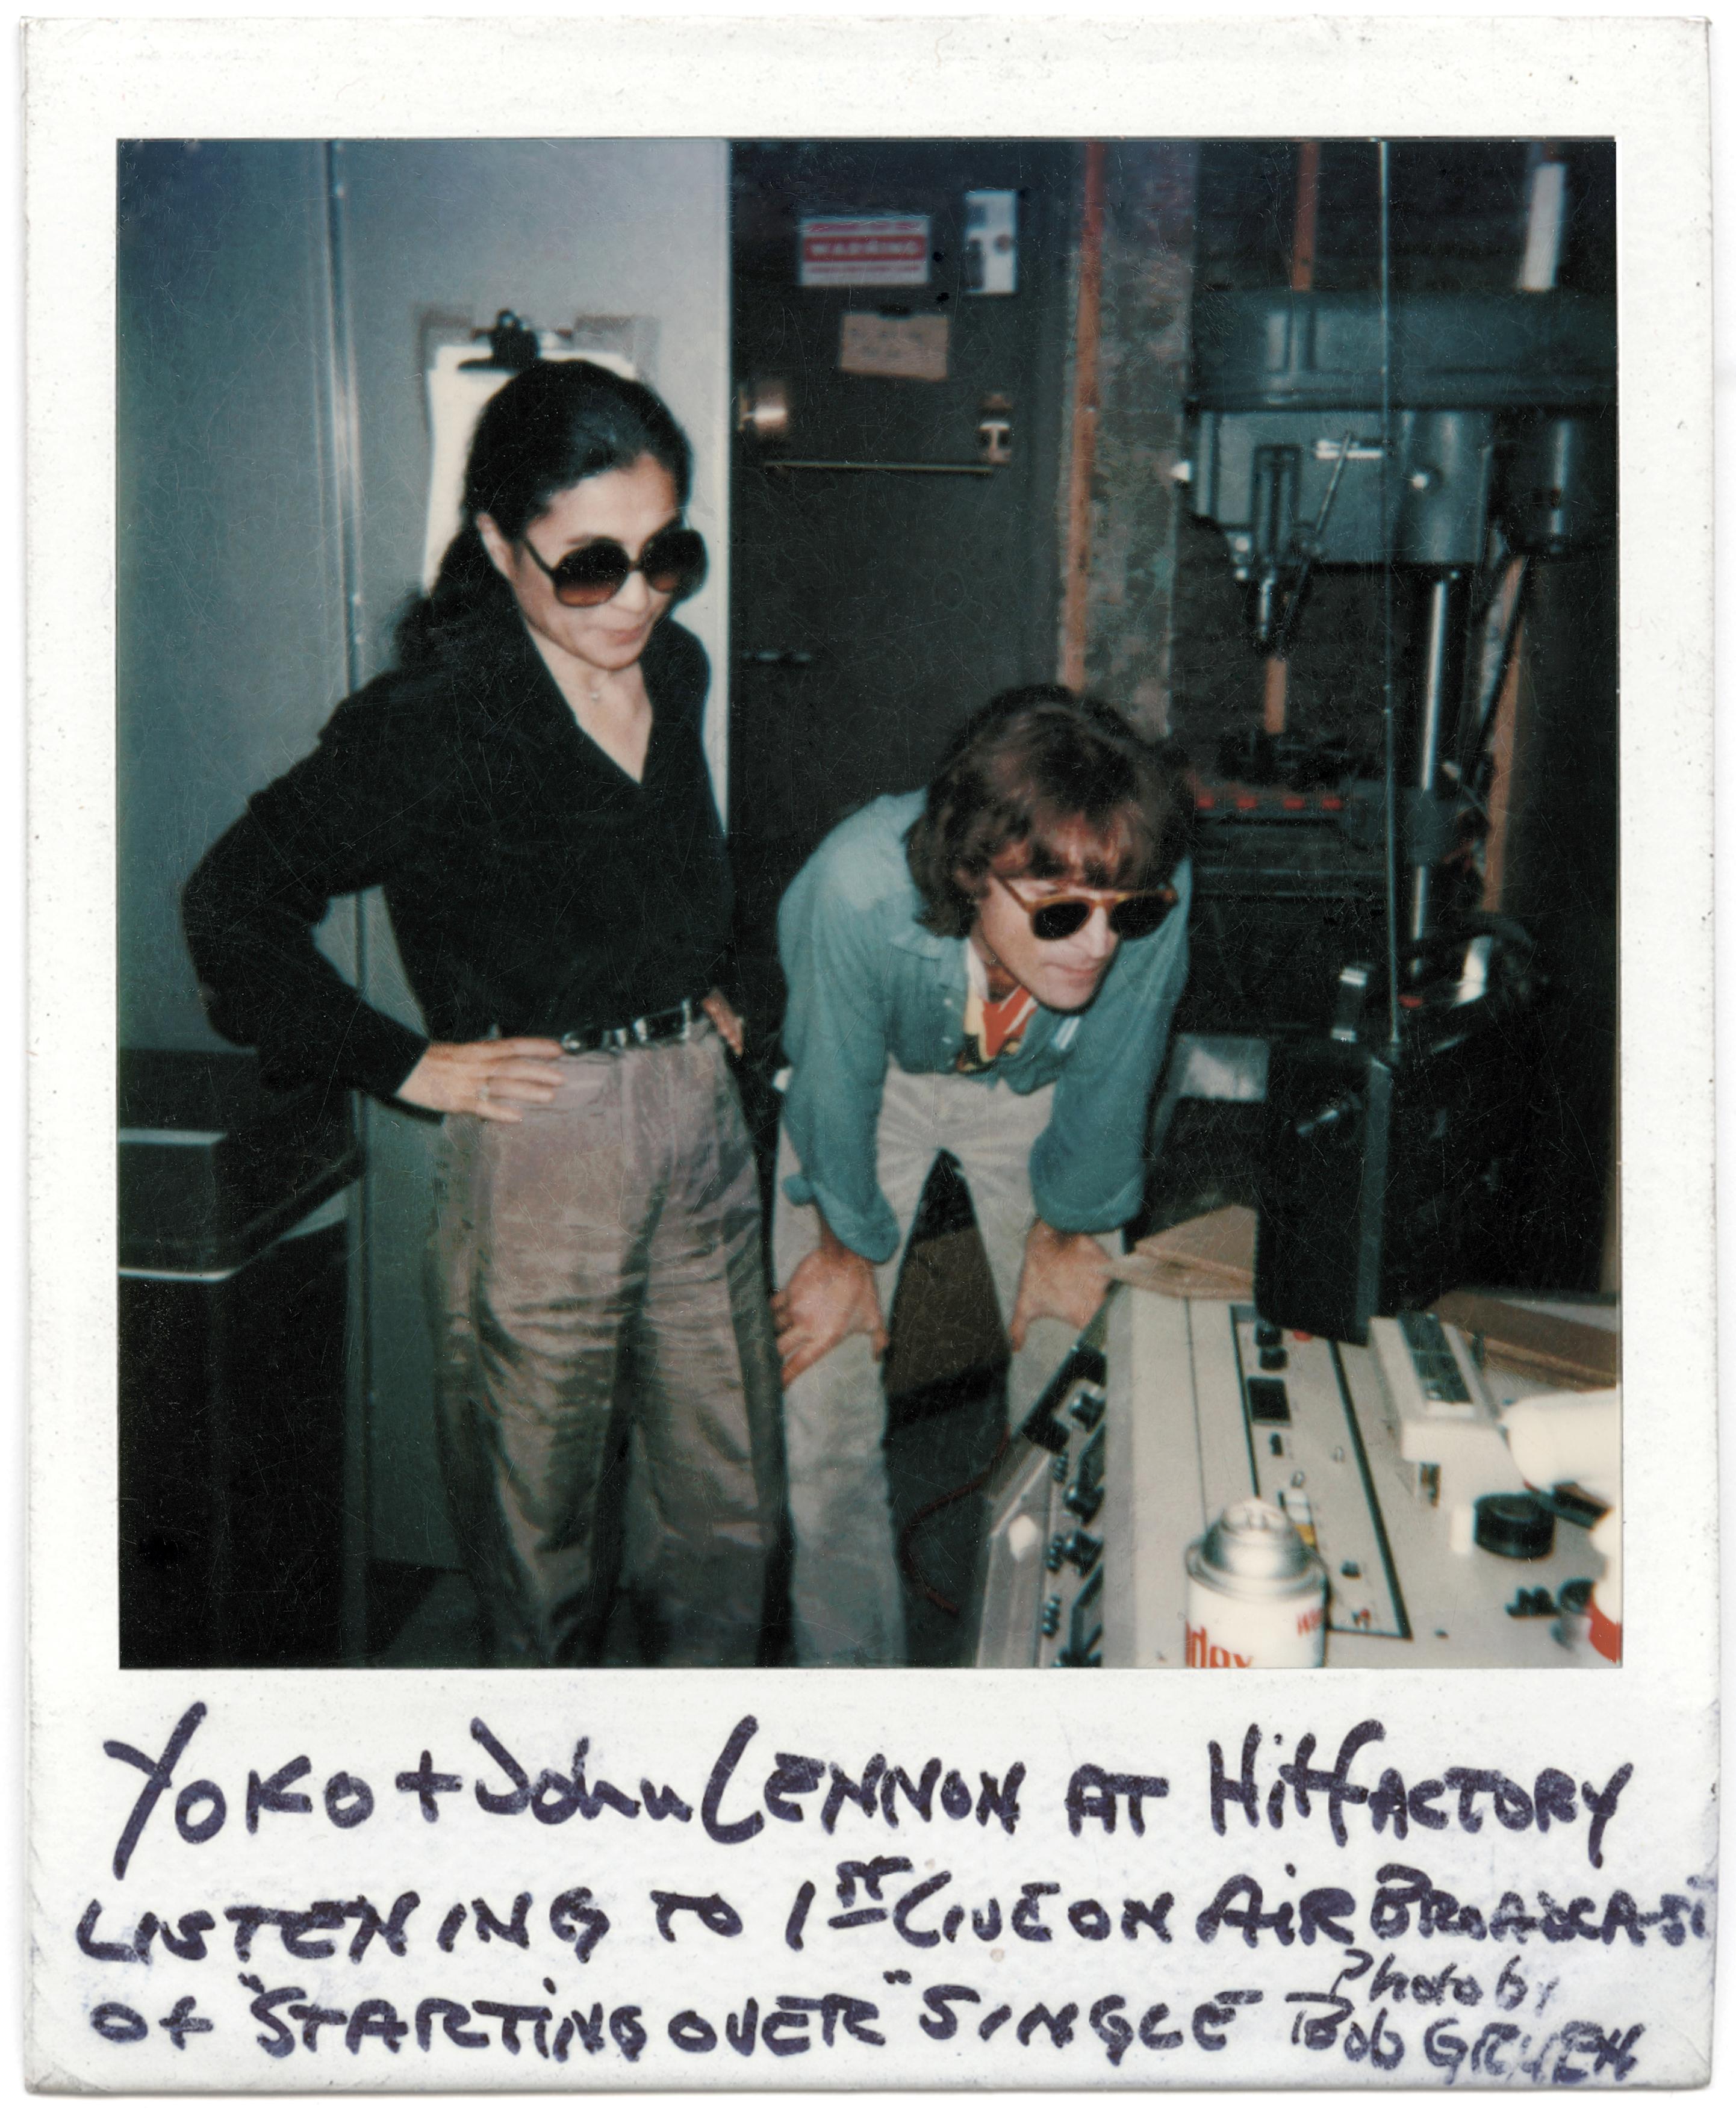 John Lennon and Yoko Ono at Hit Factors, NYC, 1980. © Bob Gruen/www.bobgruen.com